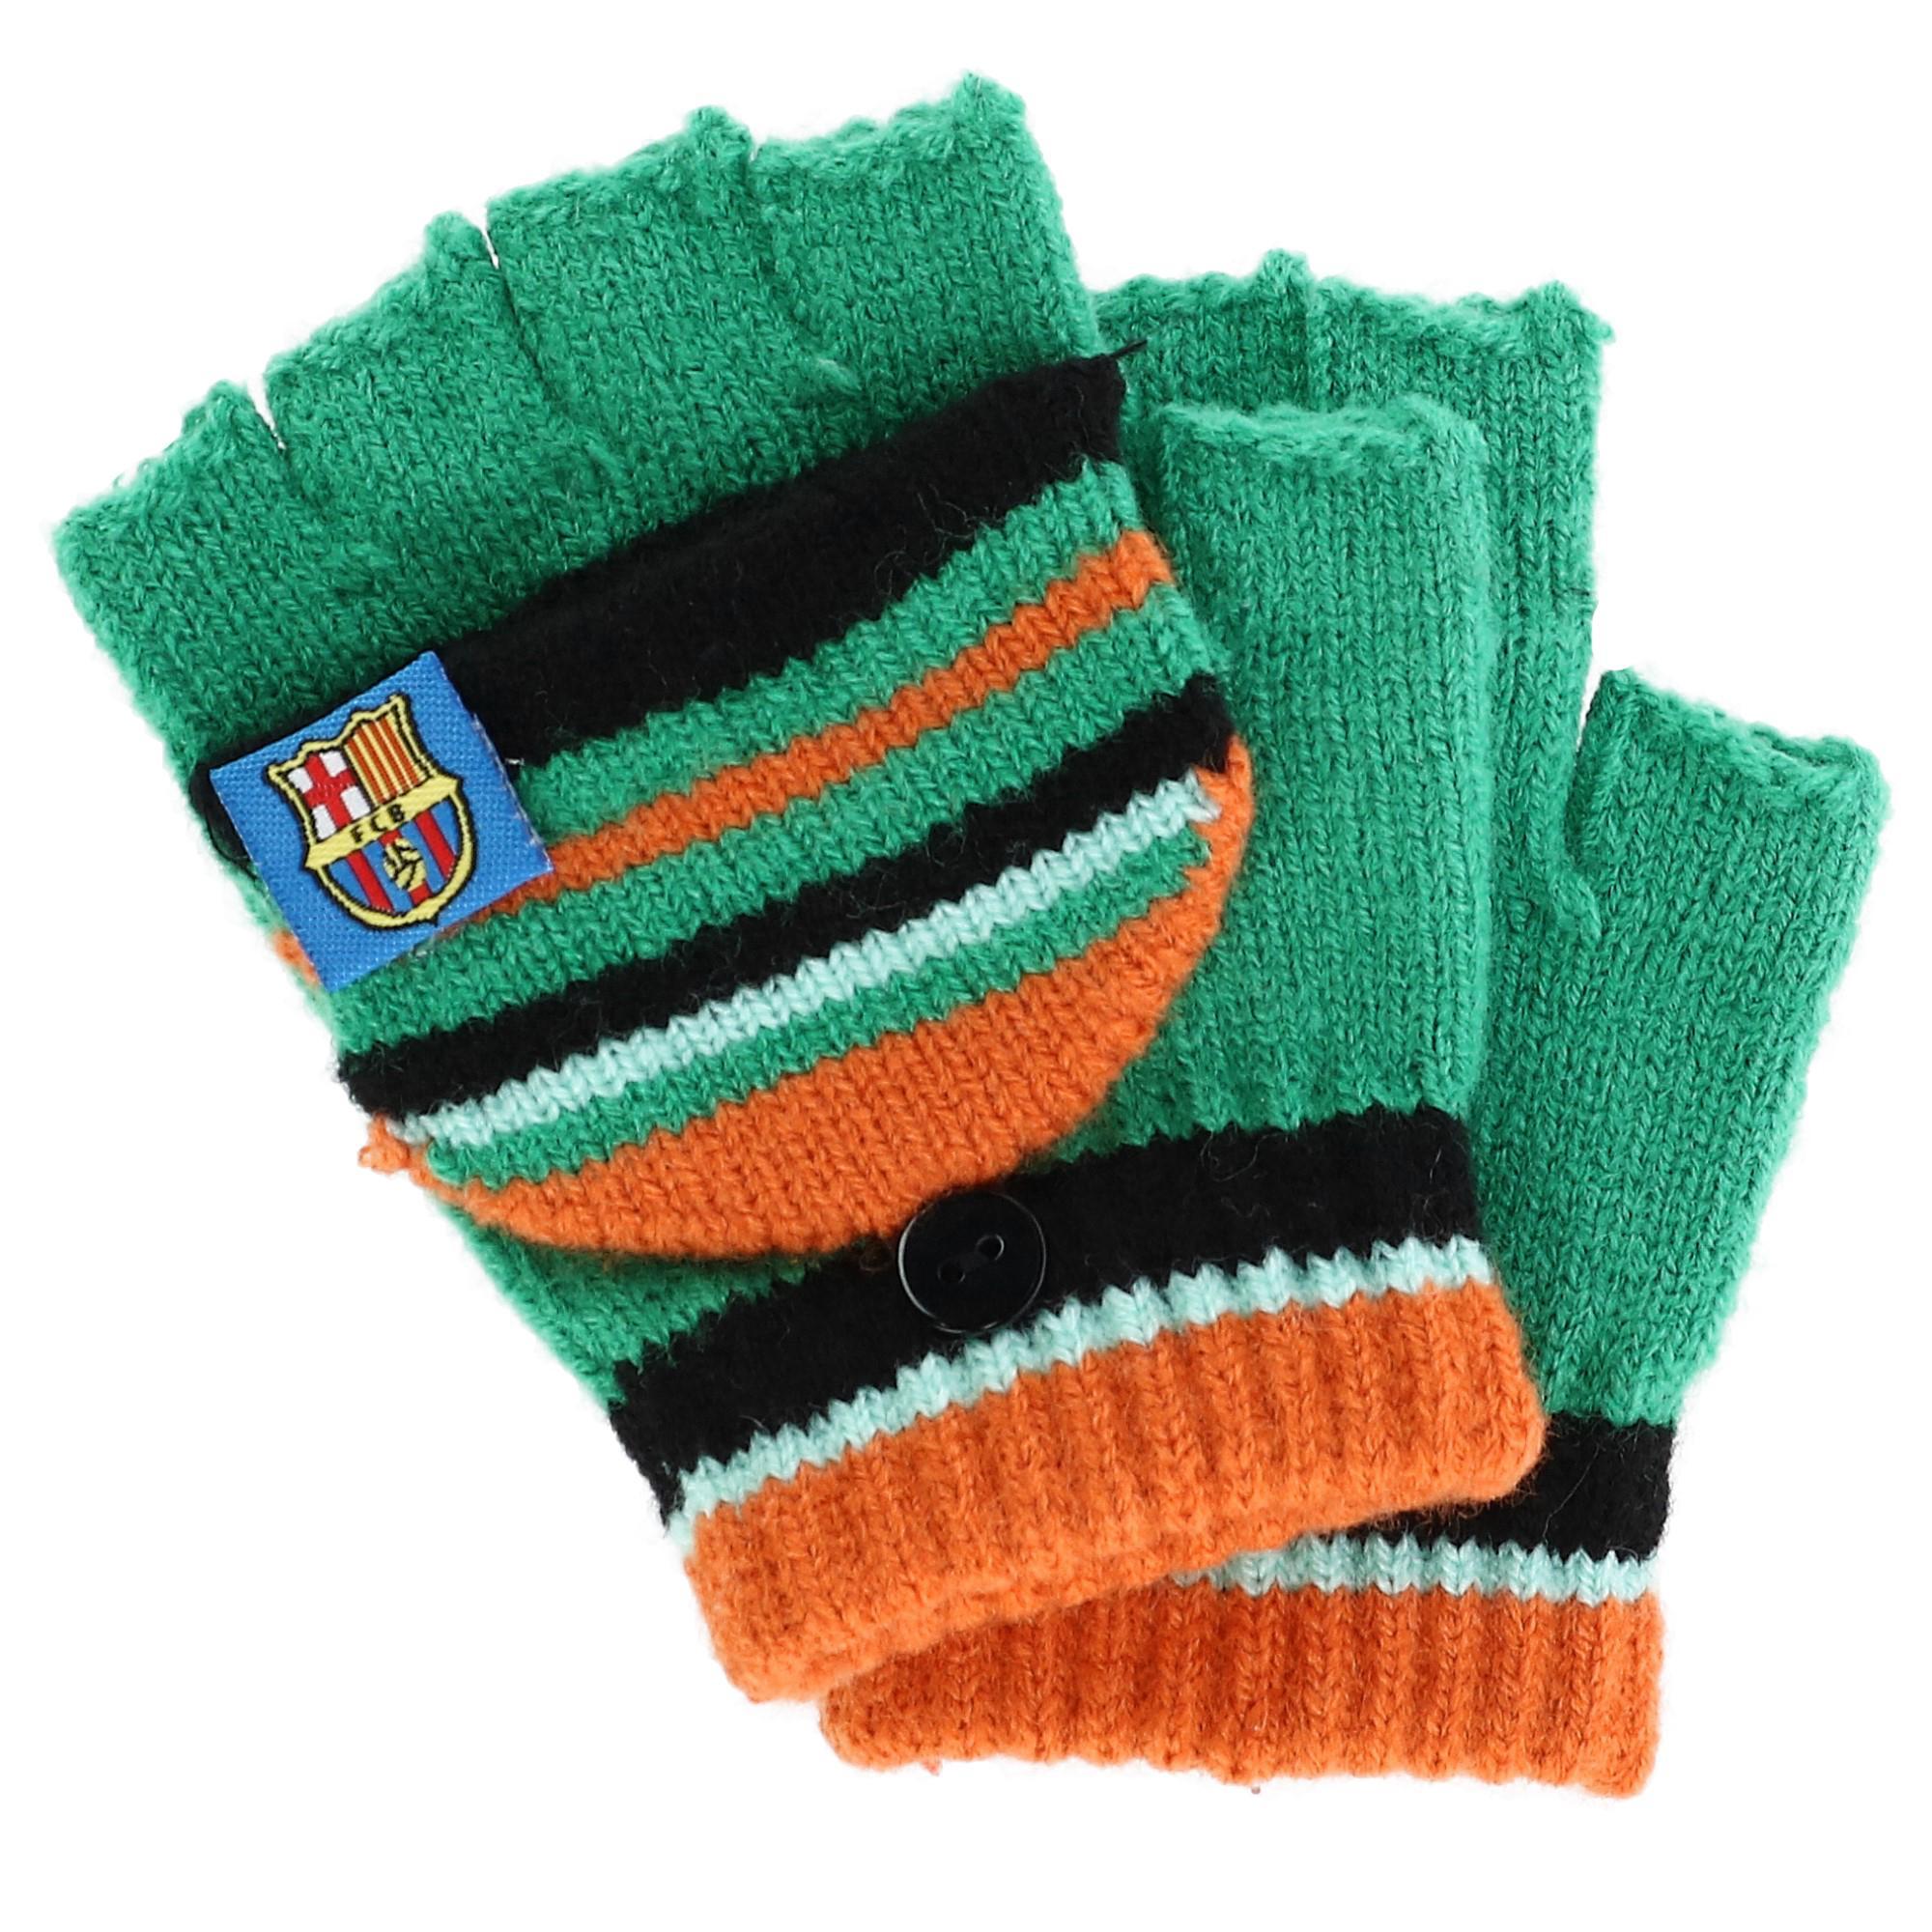 Foemo Kids 5-8 Knit Convertible Winter Mitten